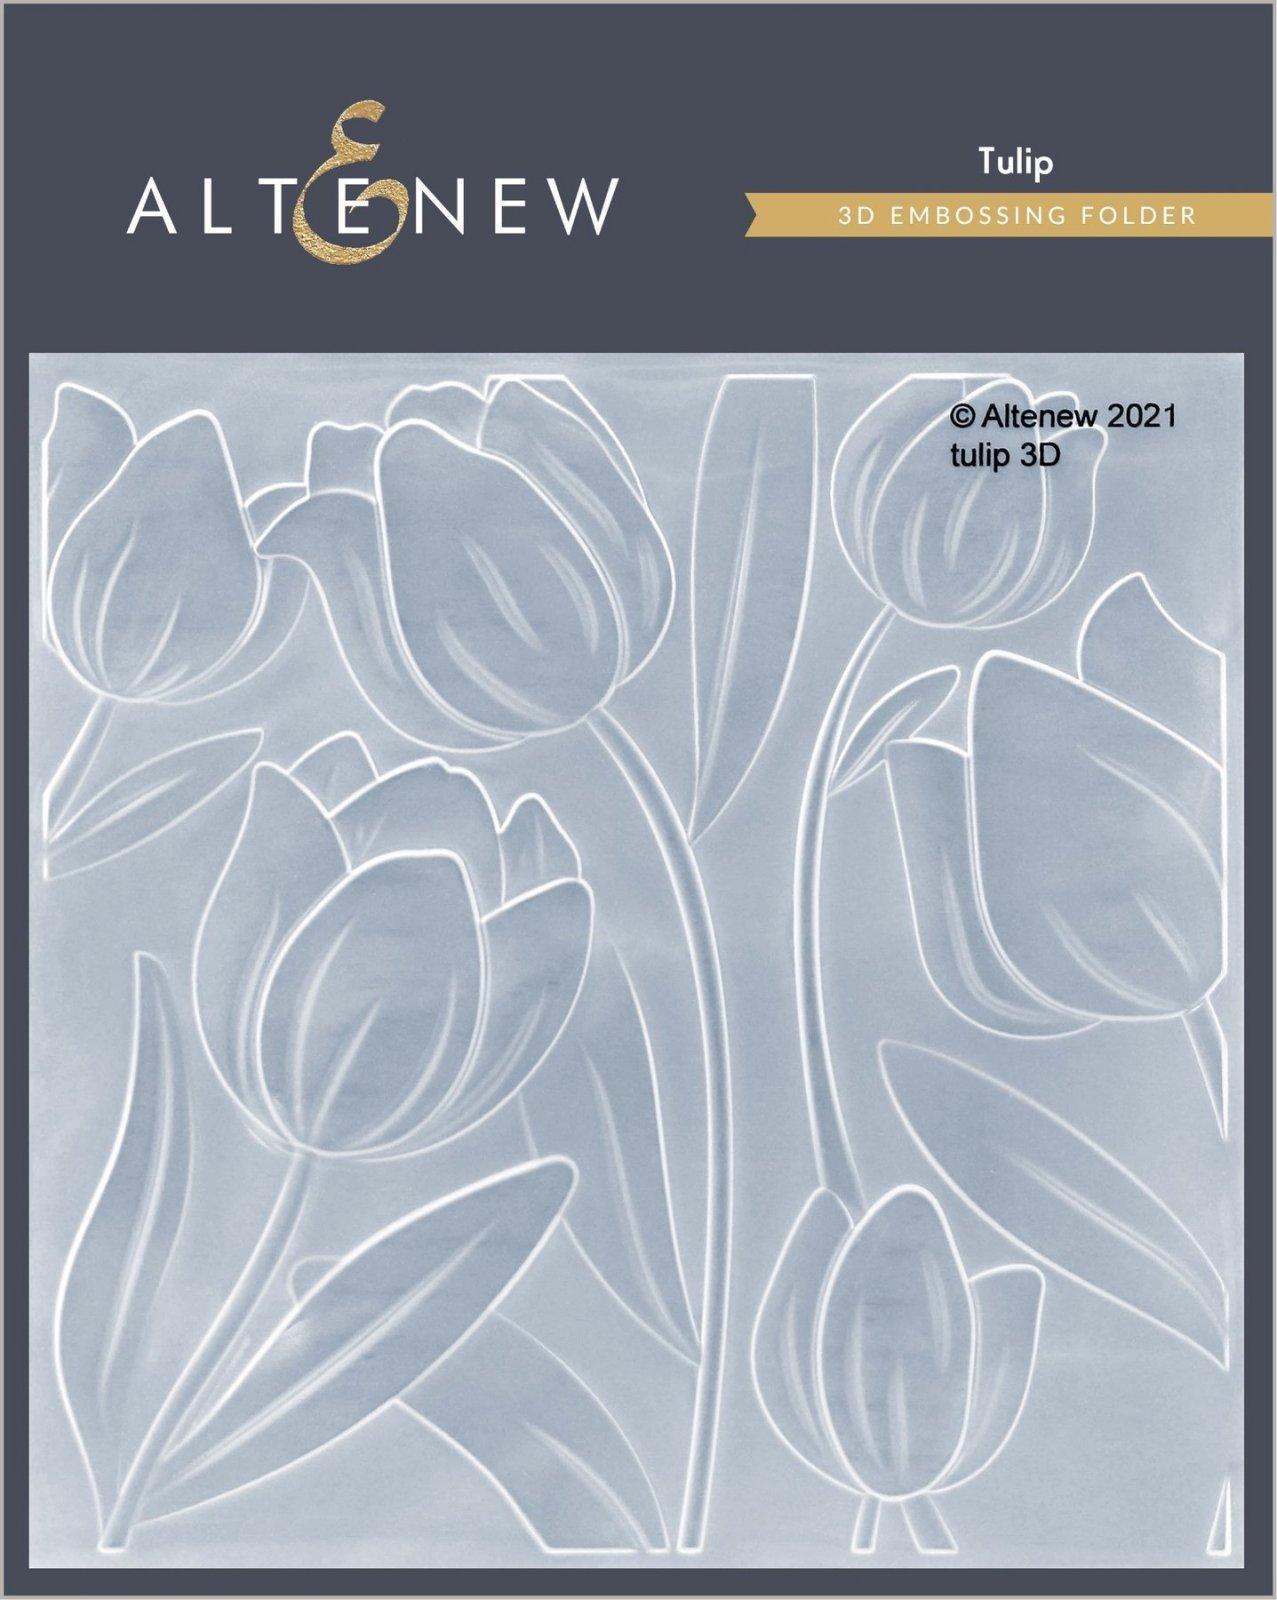 Altenew - Tulip 3D Embossing Folder